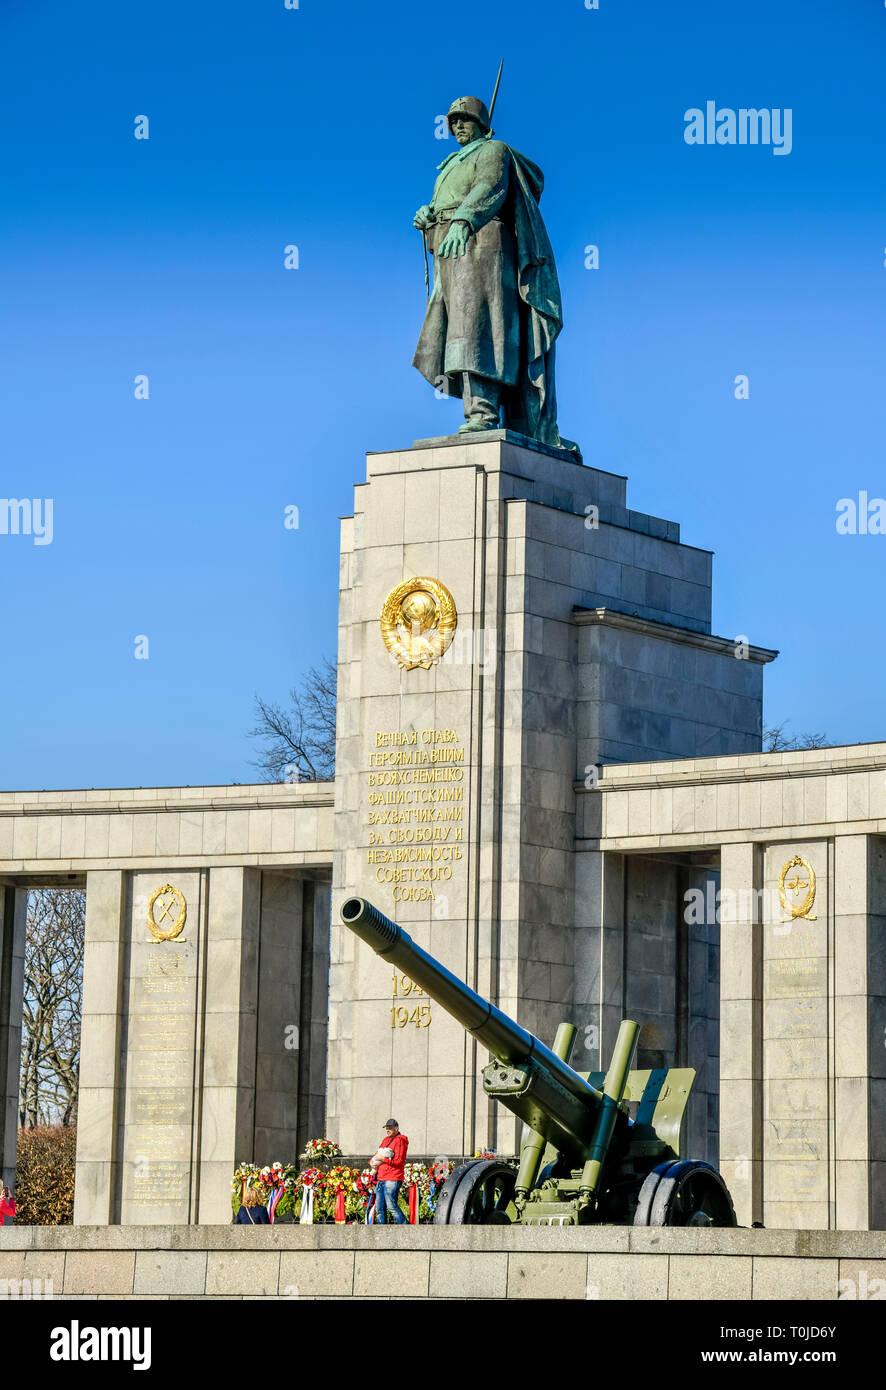 Soviet monument, street of the 17th of June, zoo, Berlin, Germany, Sowjetisches Ehrenmal, Straße des 17. Juni, Tiergarten, Deutschland - Stock Image